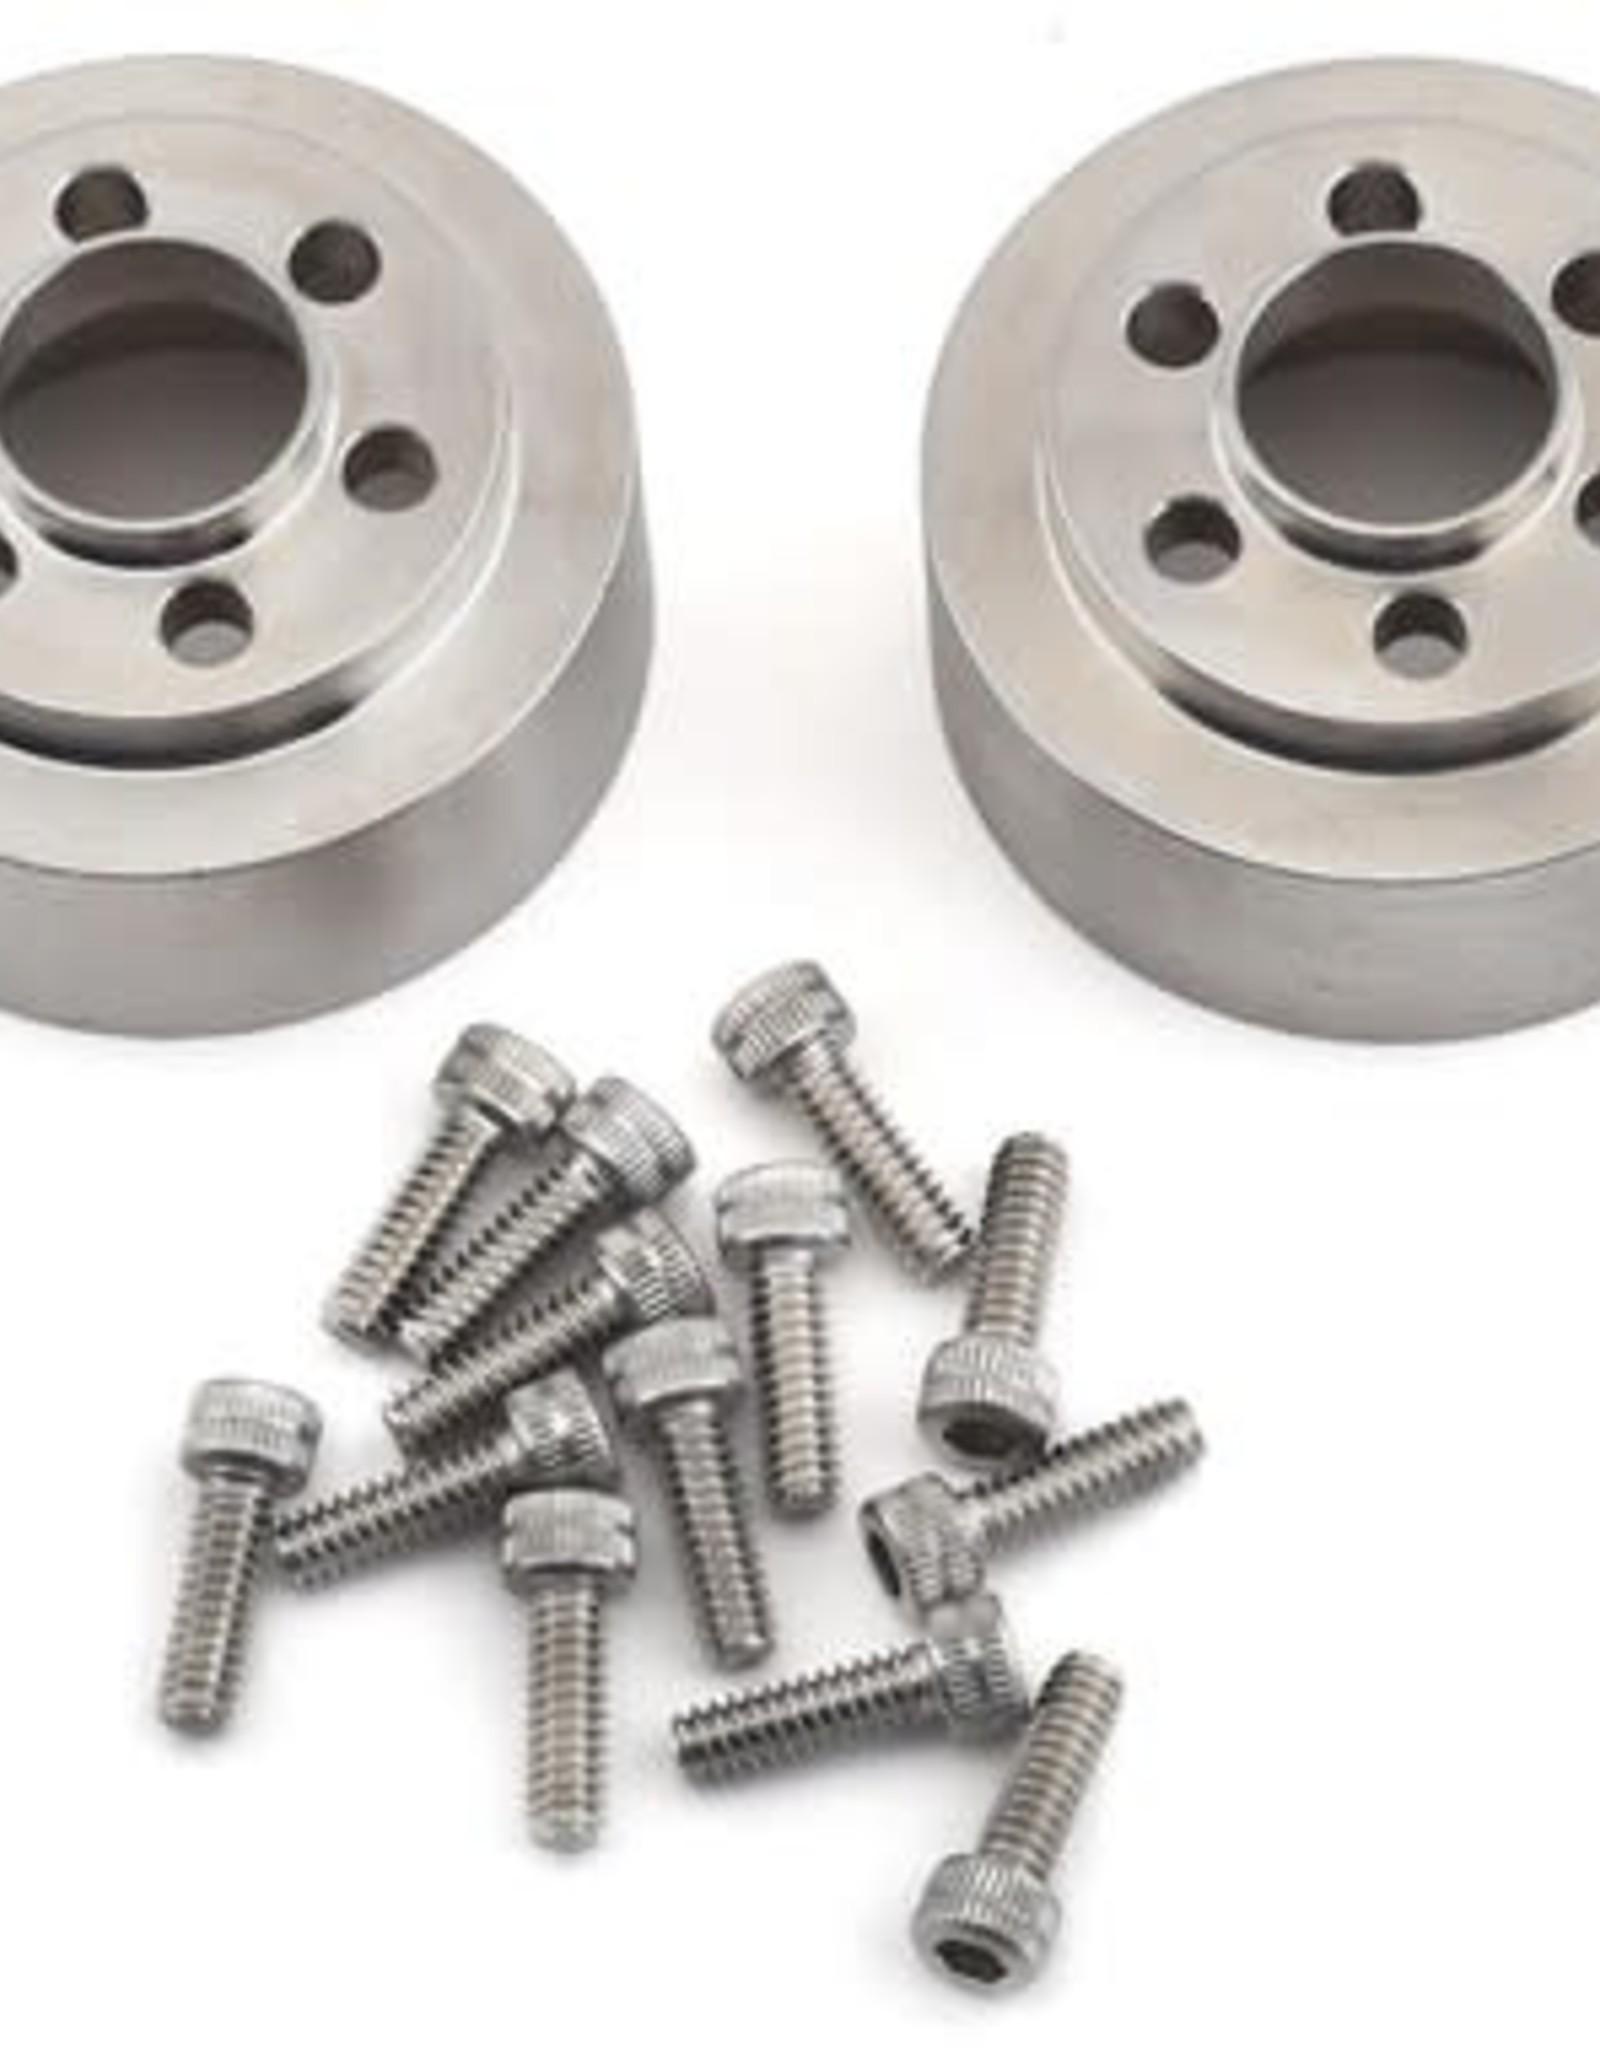 Vanquish Vanquish Products 1.9 Stainless Brake Disc Weight Set (2)